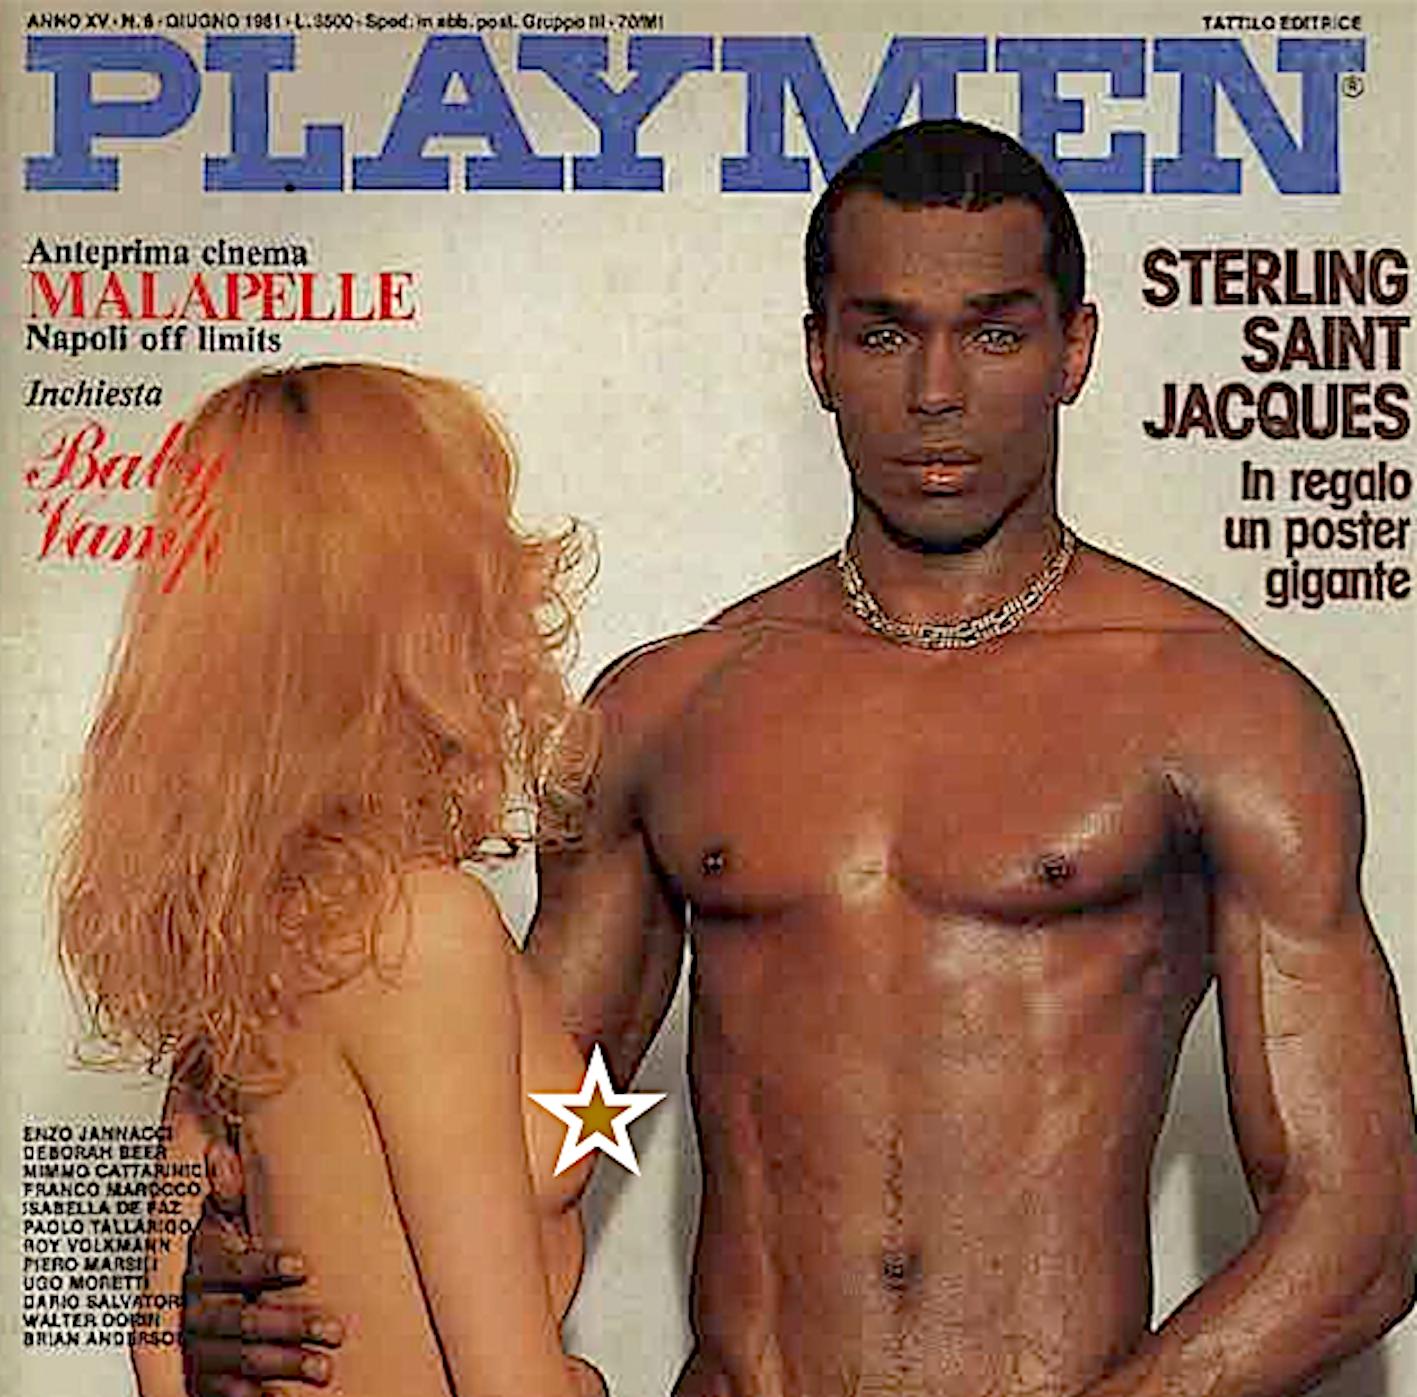 STERLING SAINT JACQUES musica curiosando anni 70 80